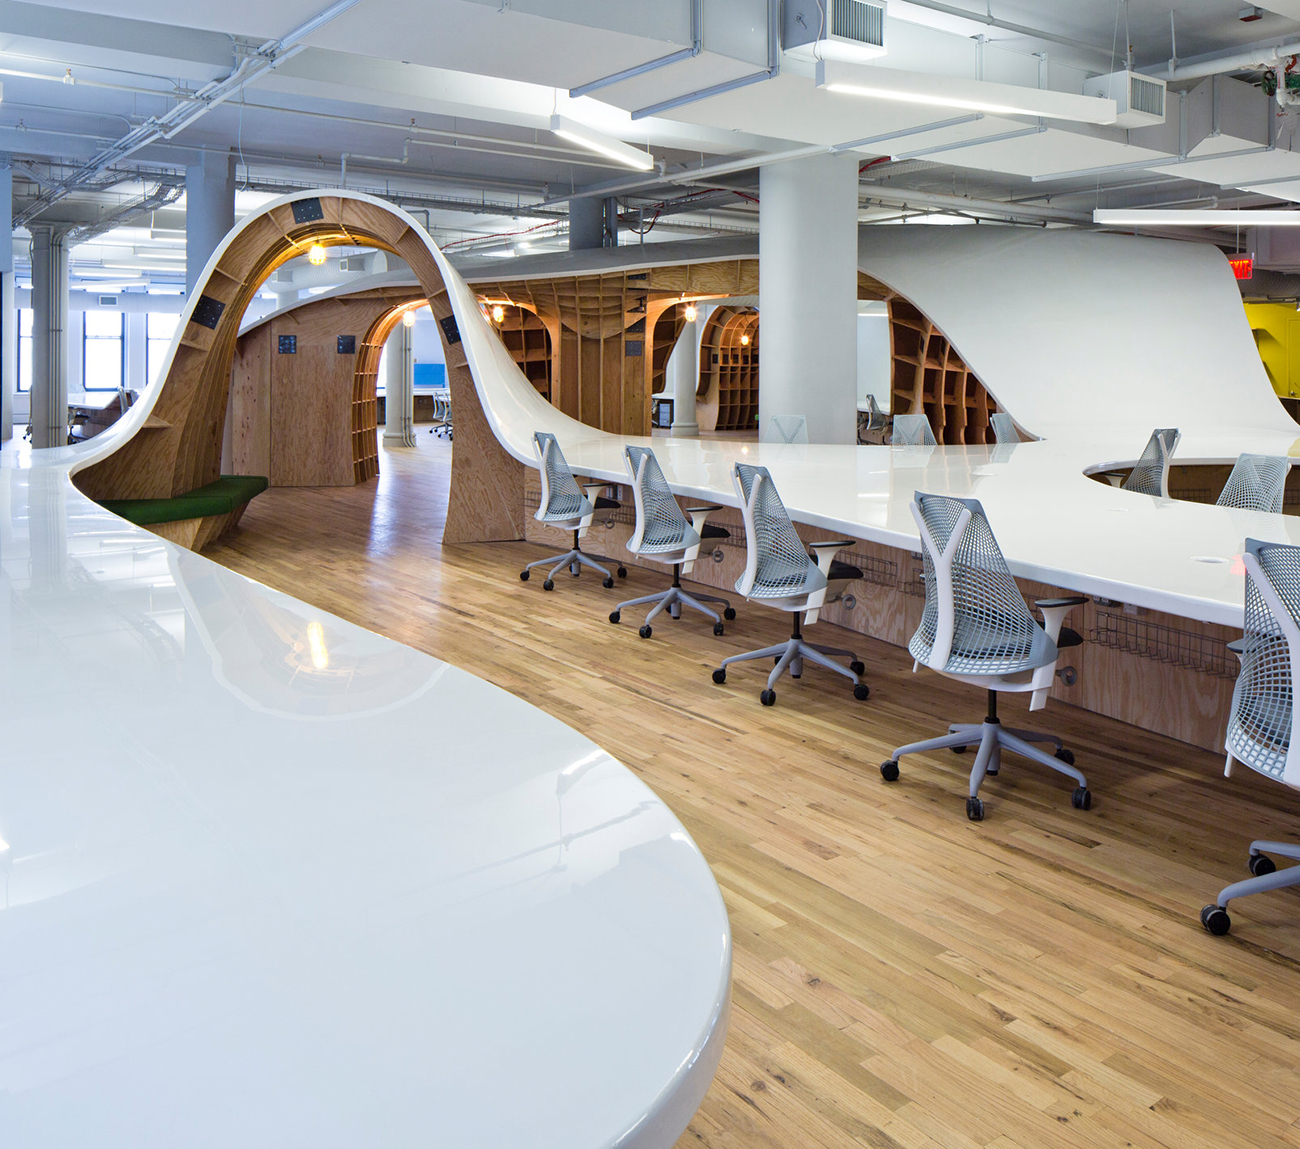 Clive-Wilkinson-Superdesk-Barbarian-Group-Office-Workspace-4.jpg